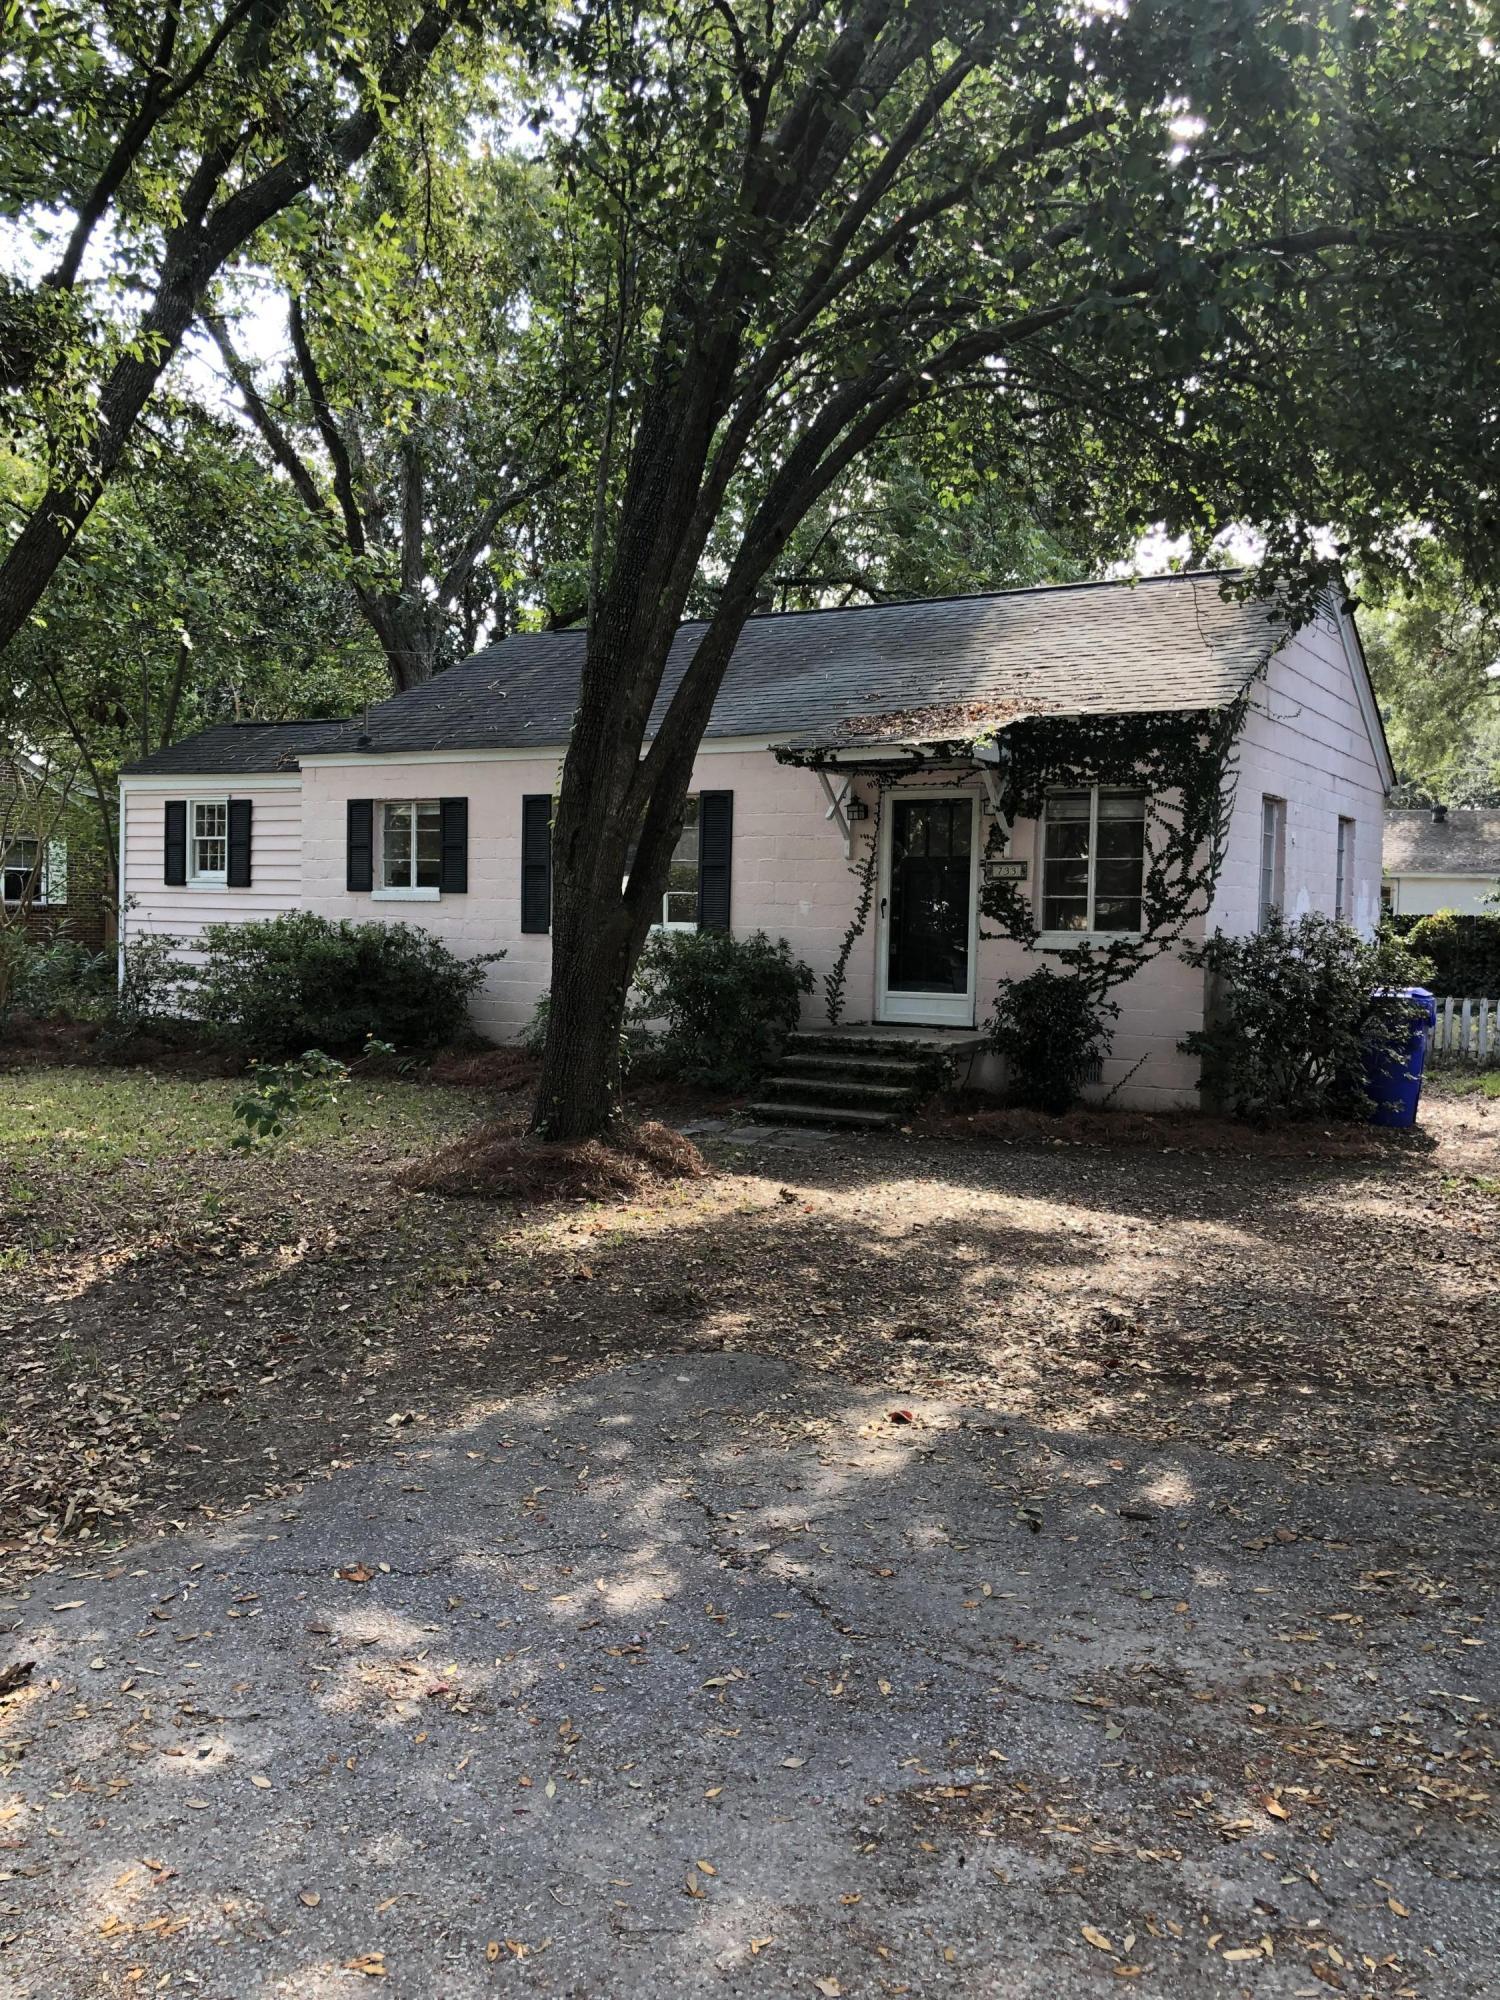 Old Mt Pleasant Homes For Sale - 733 Adluh, Mount Pleasant, SC - 9